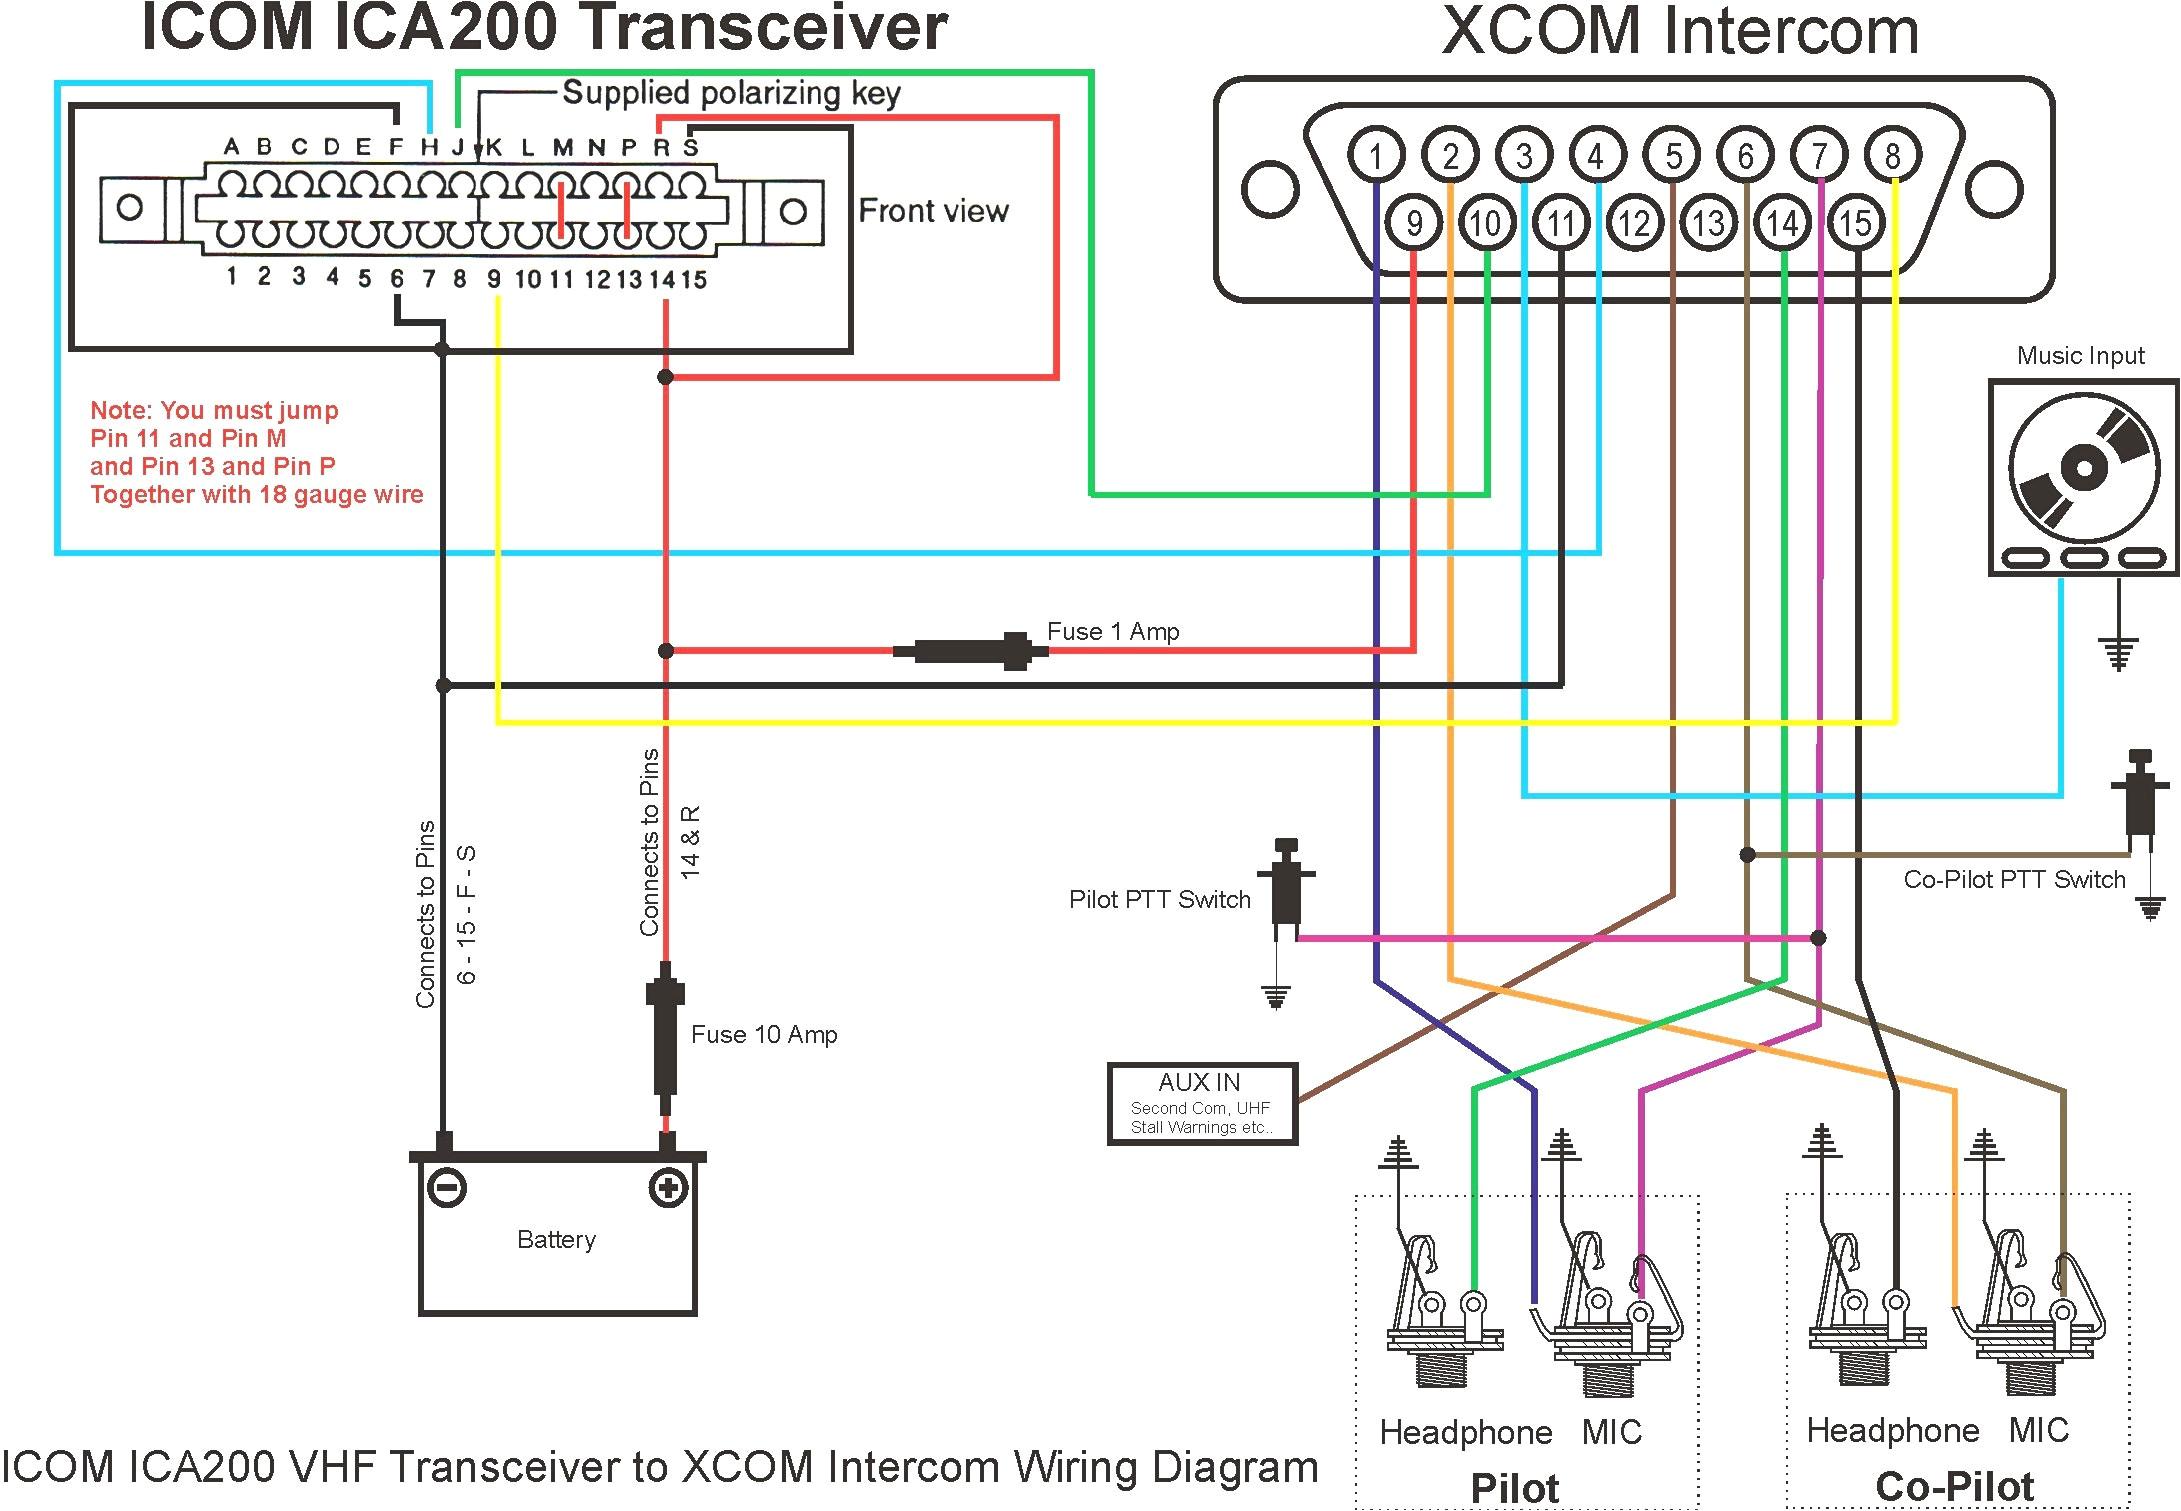 Softcomm Intercom Wiring Diagram 37 softcomm Intercom Wiring Diagram Wire Diagram